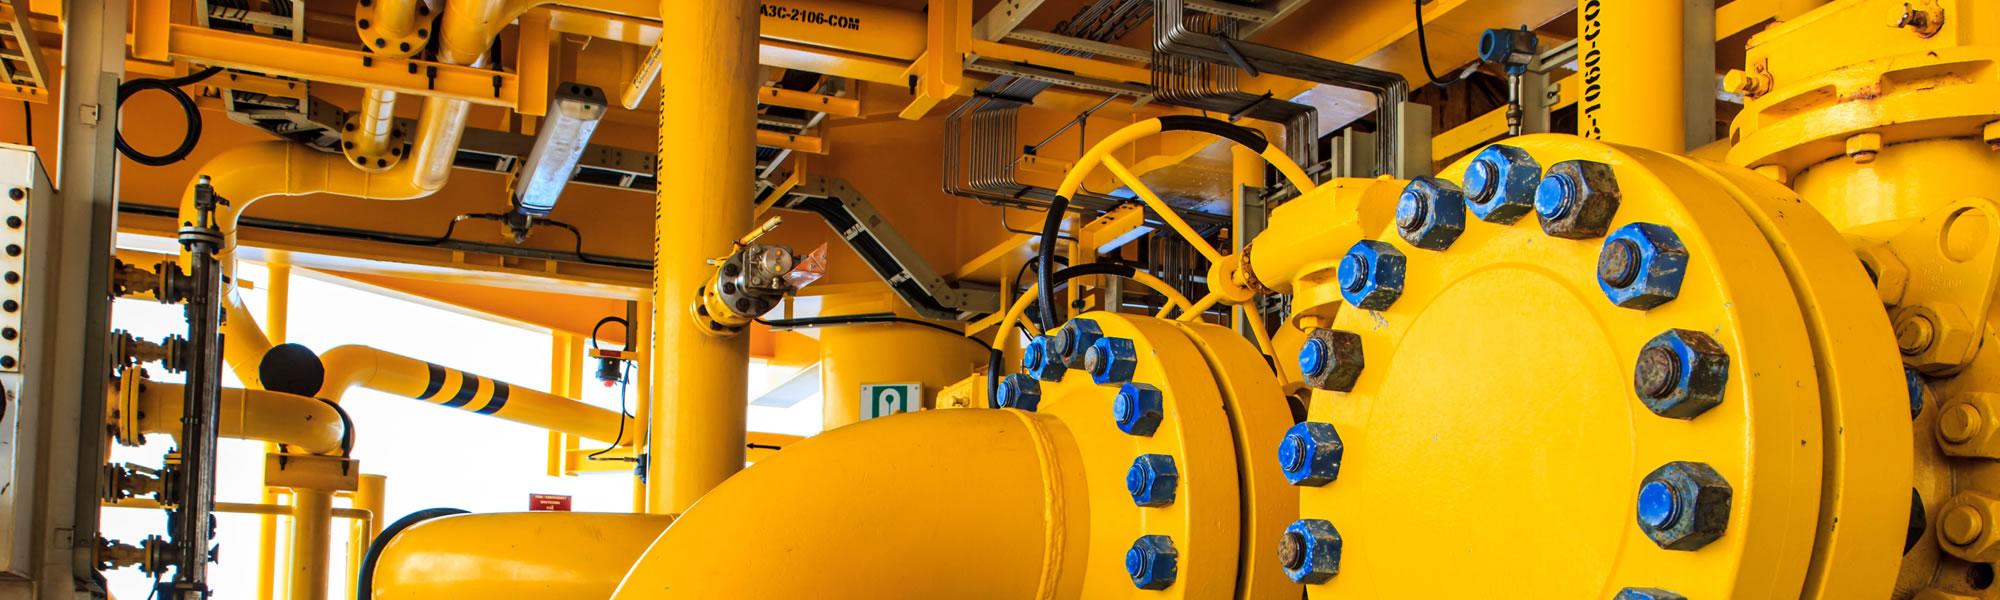 banner-1-total-valve-managment